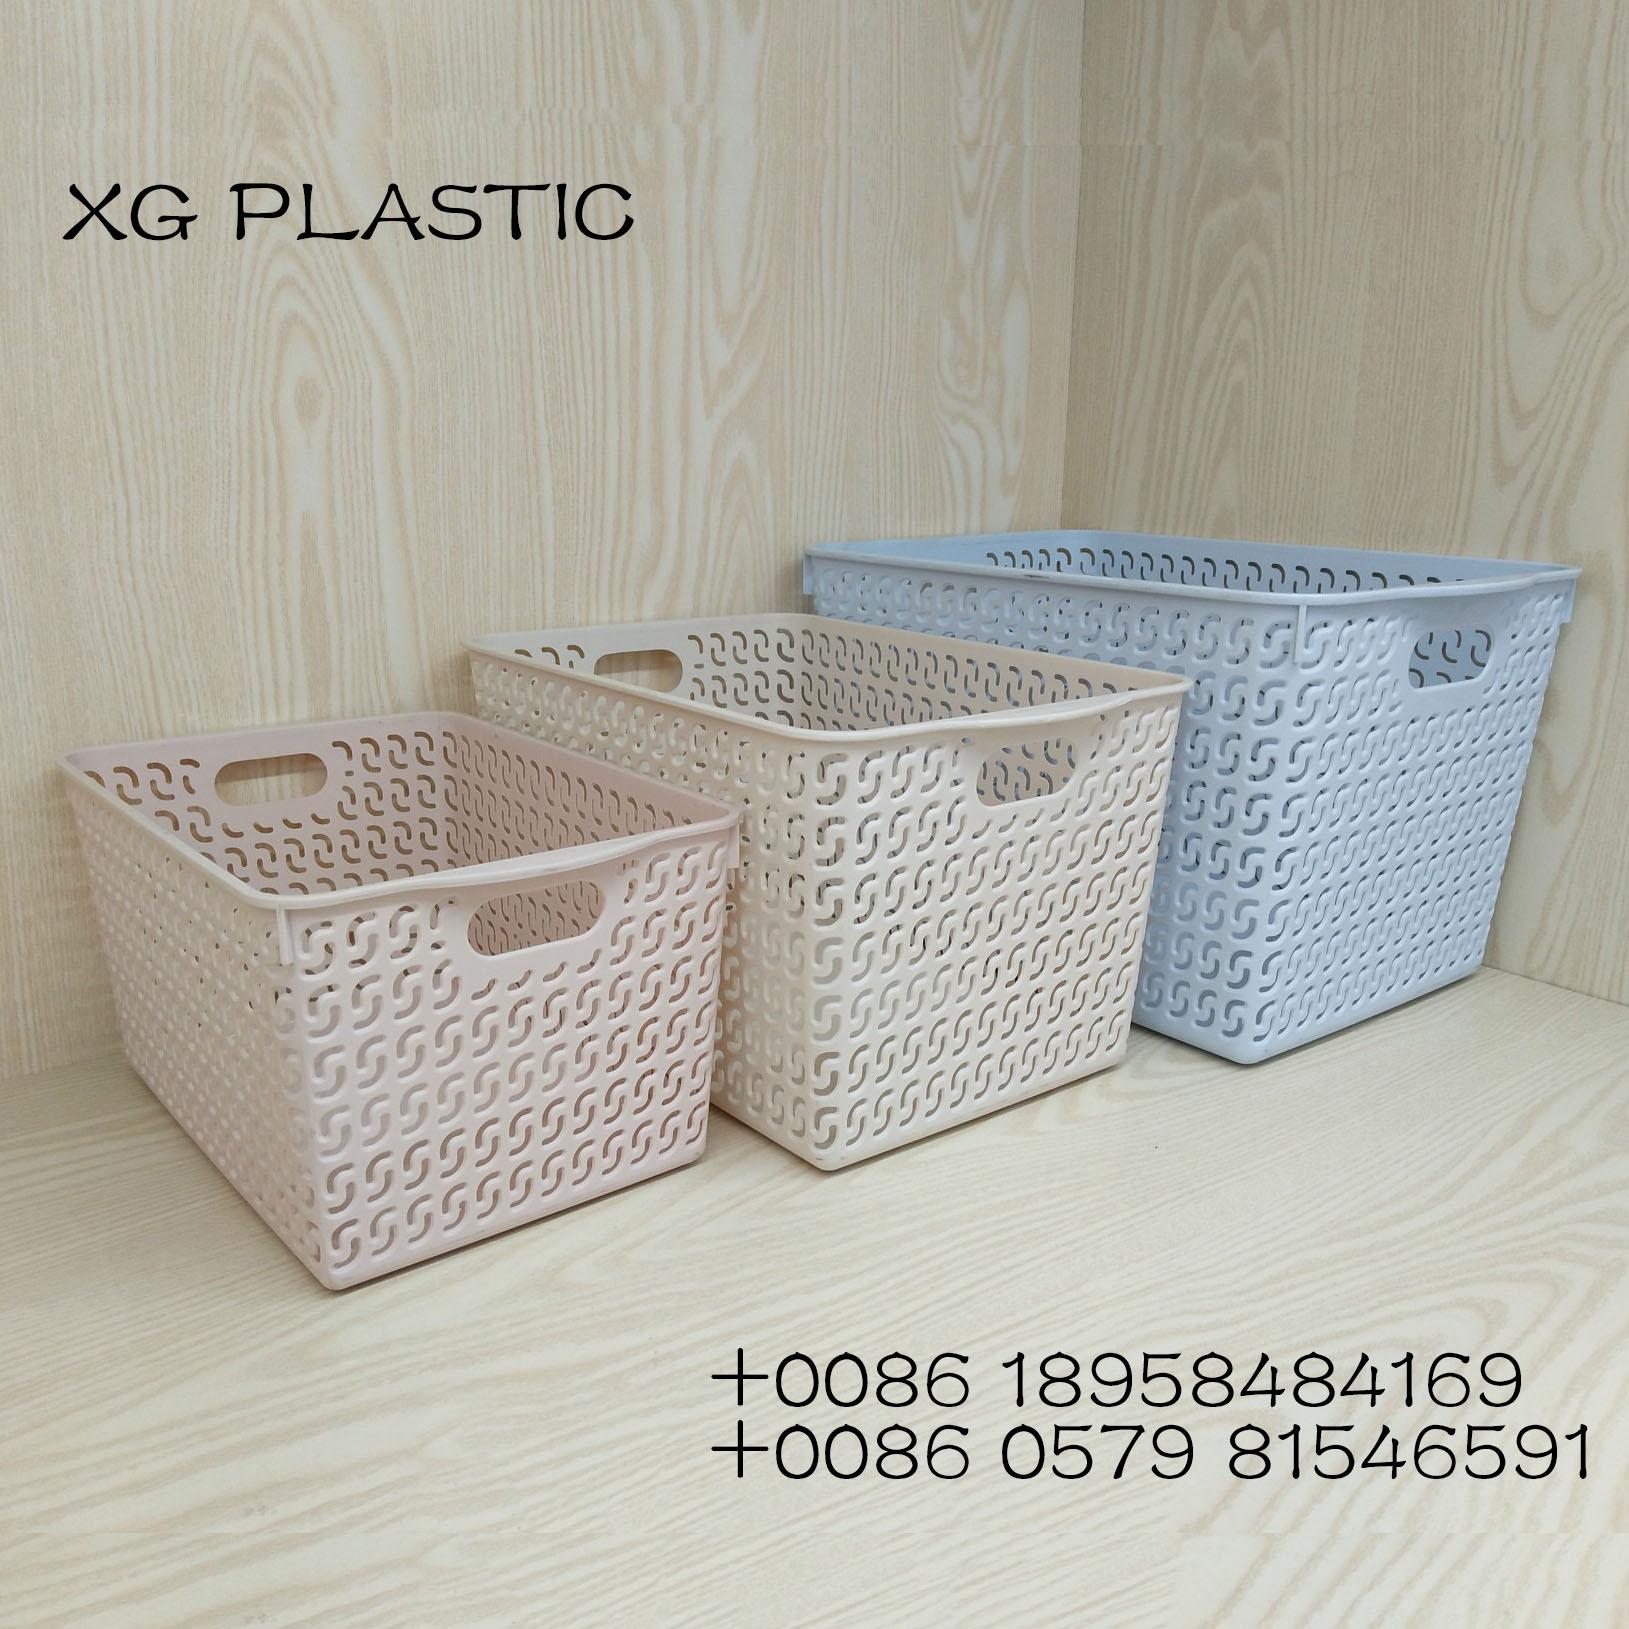 Supply Plastic Storage Baskets Bins Organizer With Handles for sizing 1629 X 1629